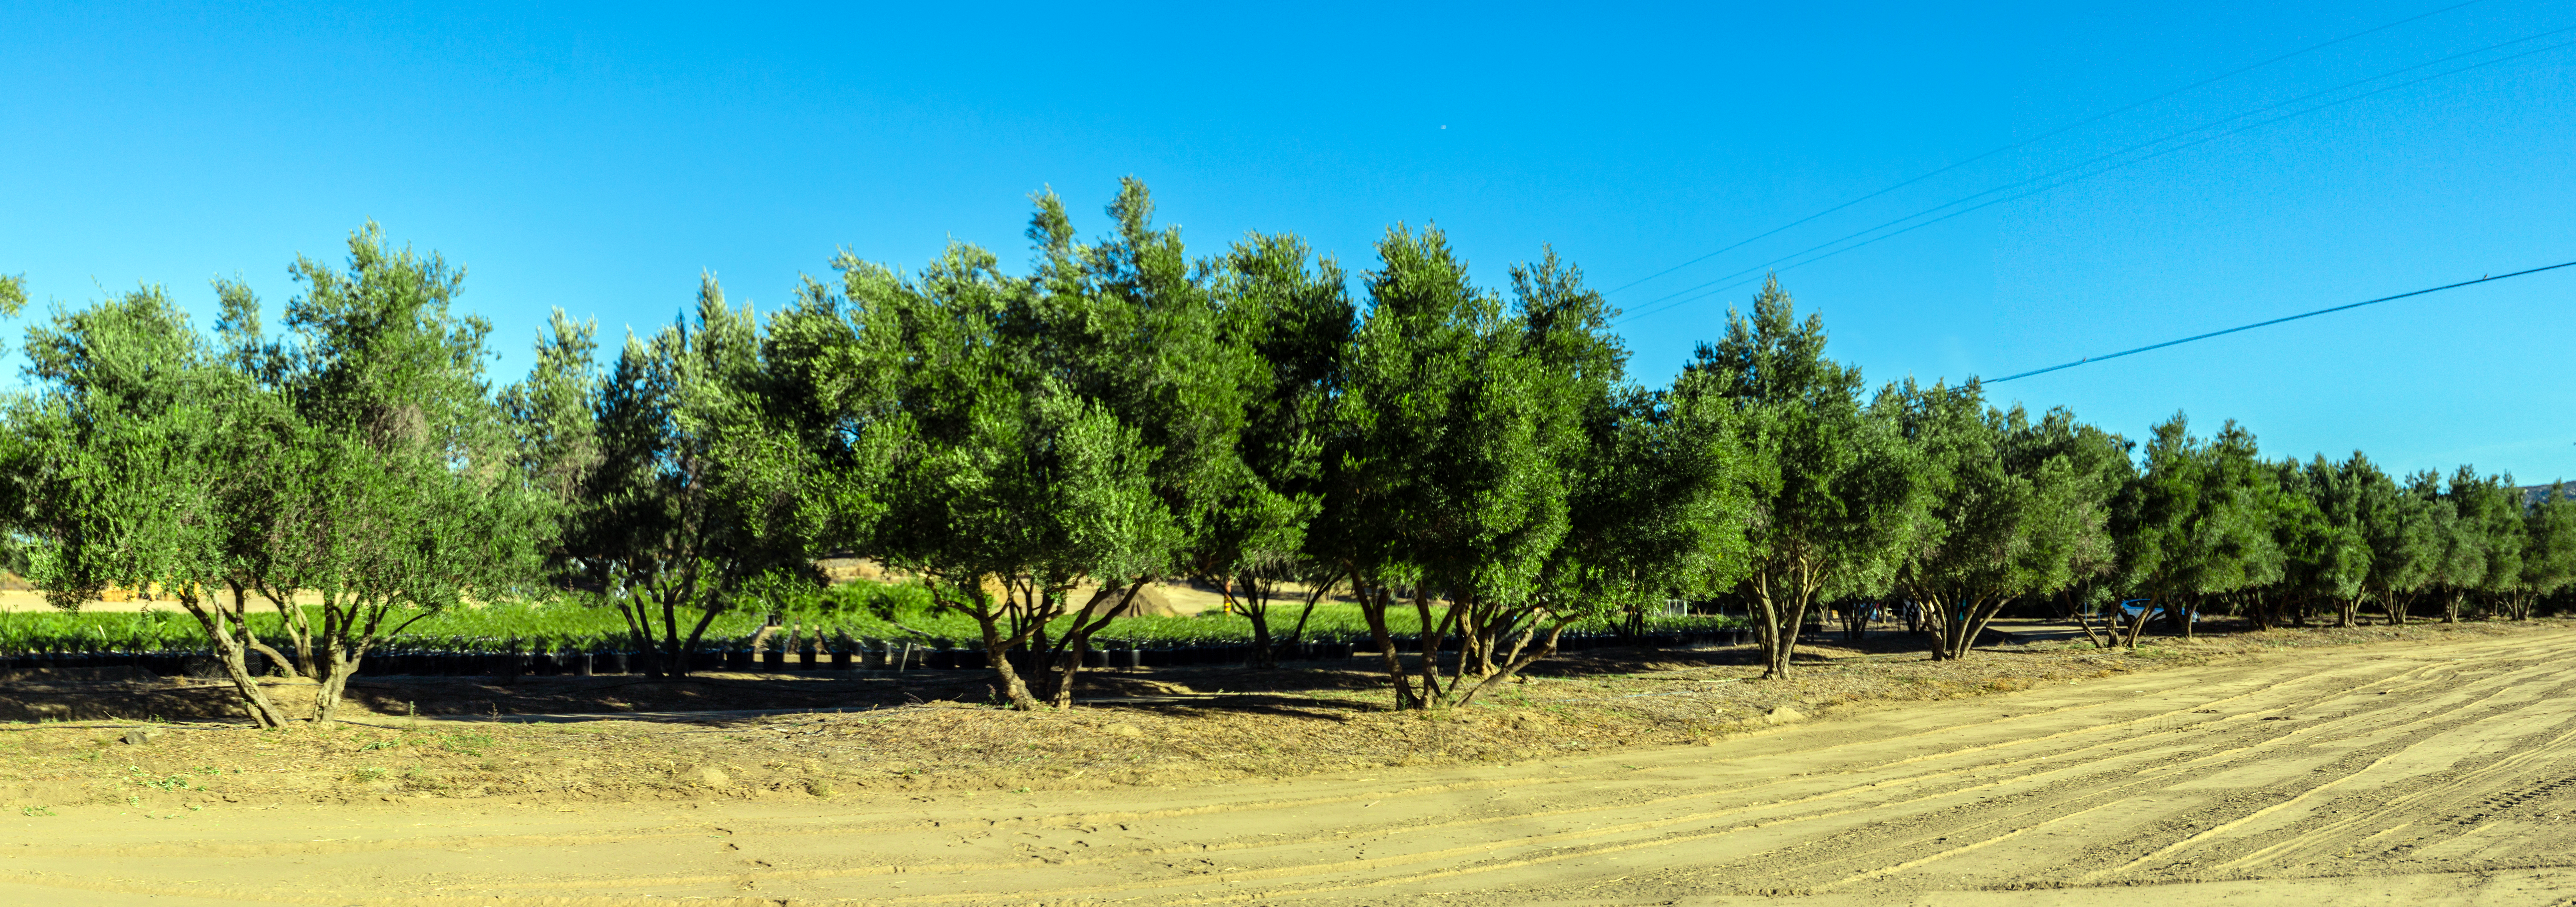 Olive_trees_farm